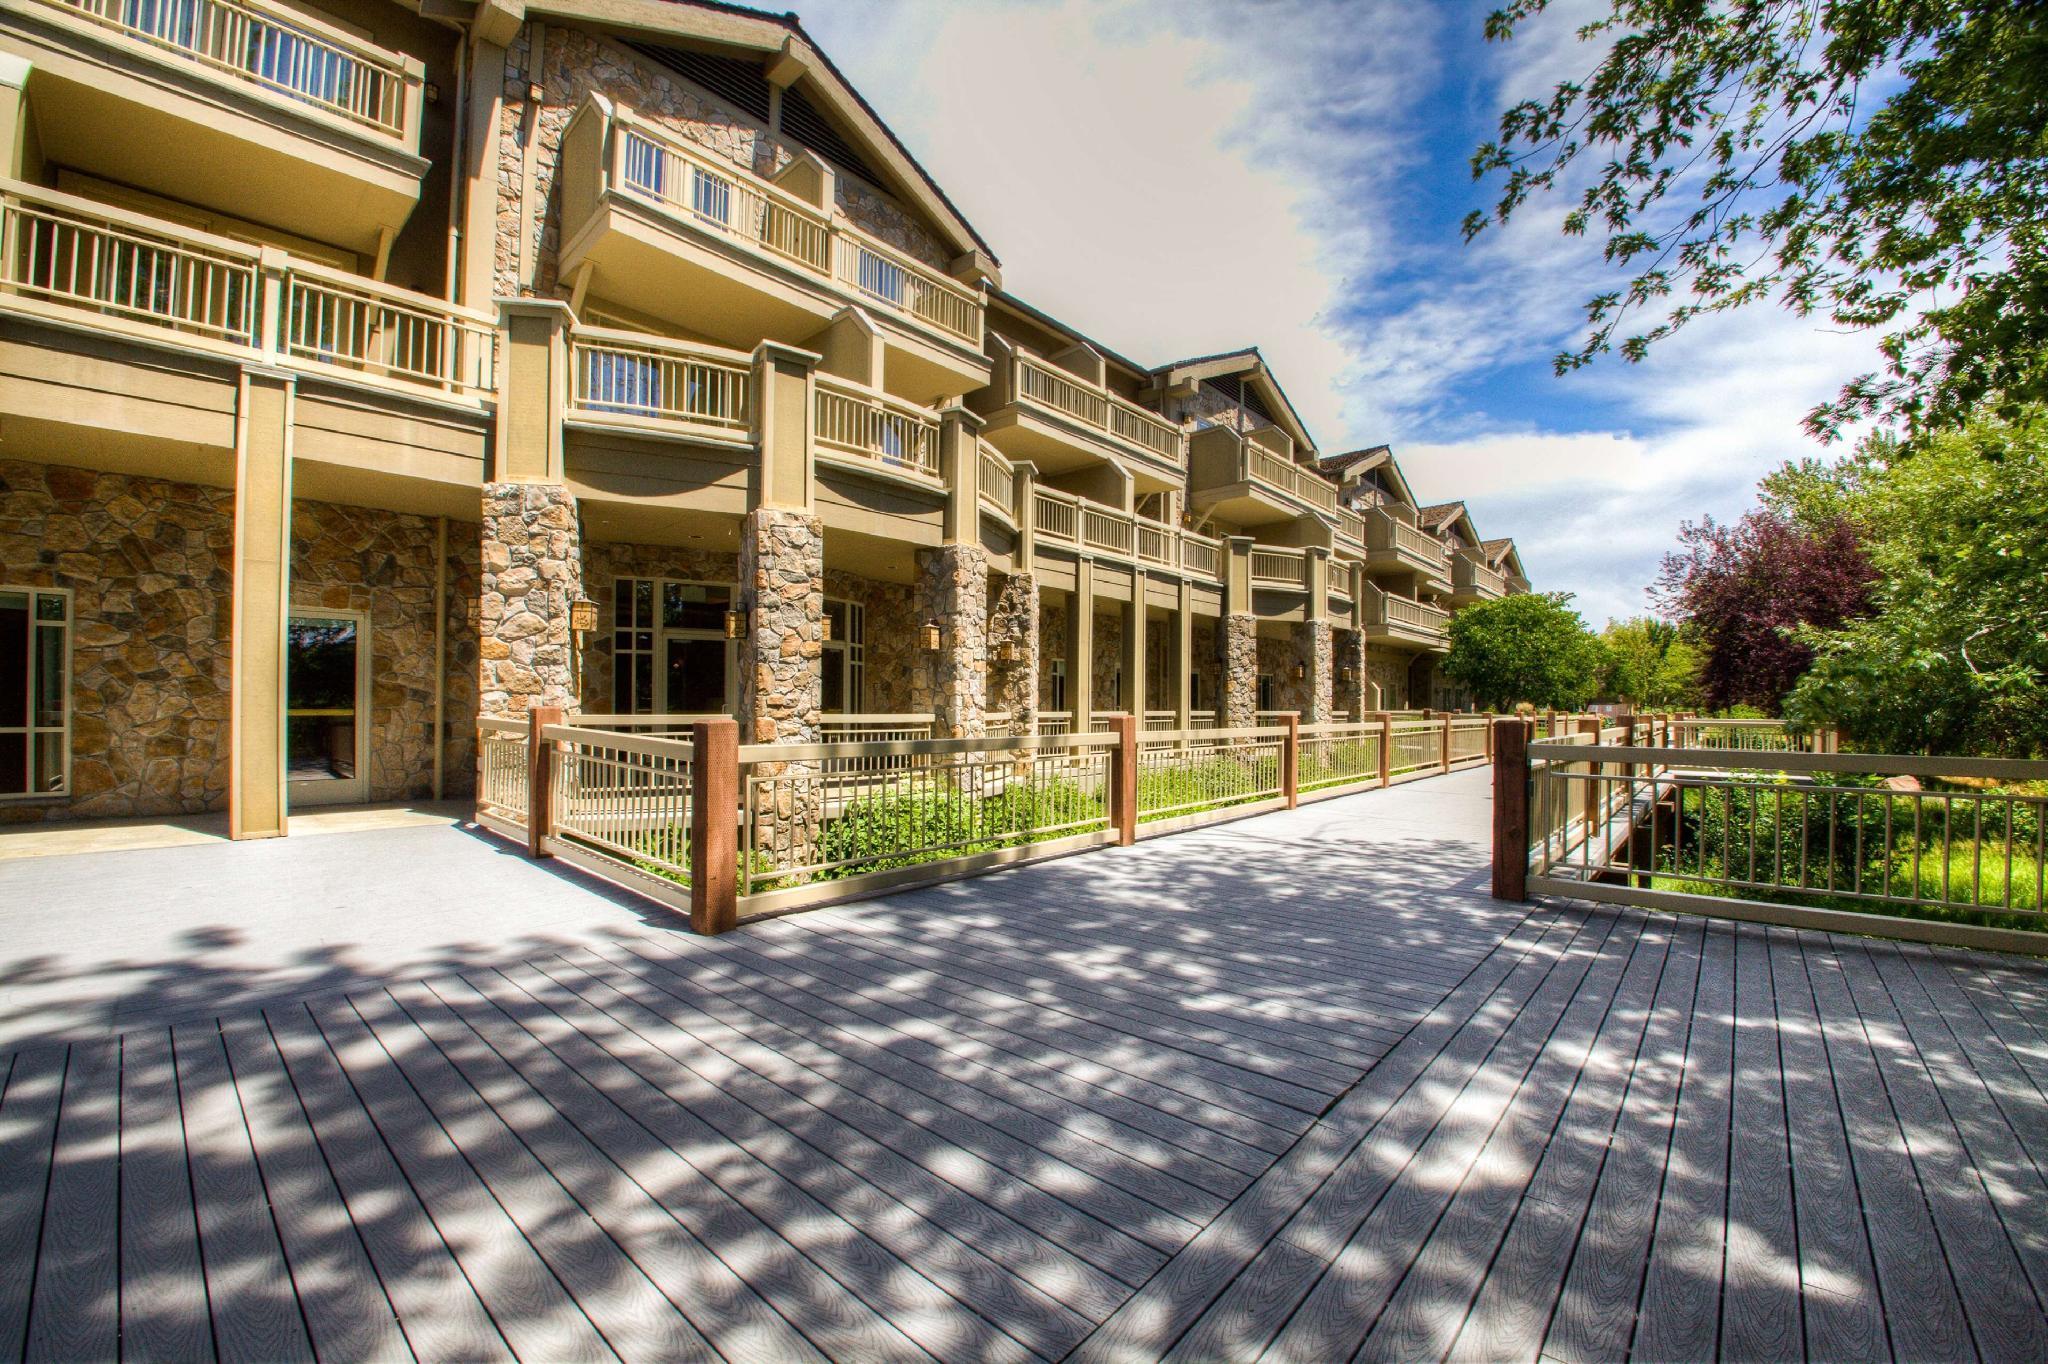 Hilton Garden Inn Boise - Eagle Hotel